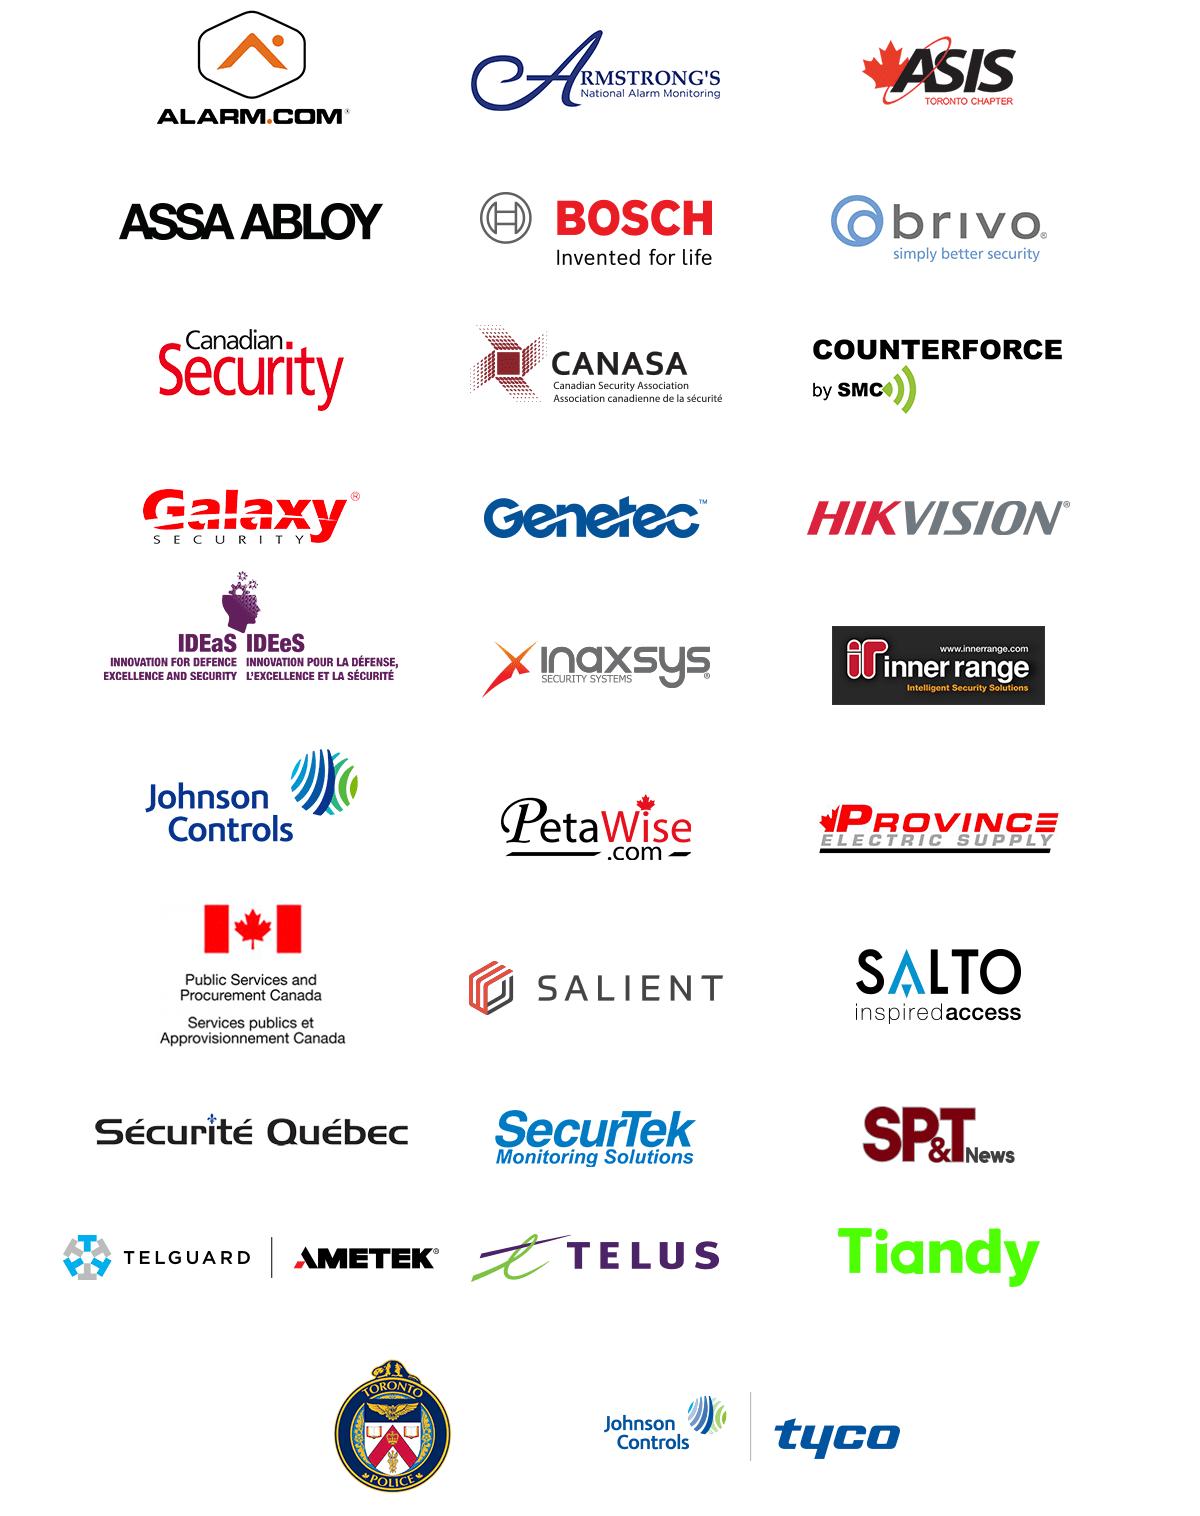 CanadaSecuritySponsors